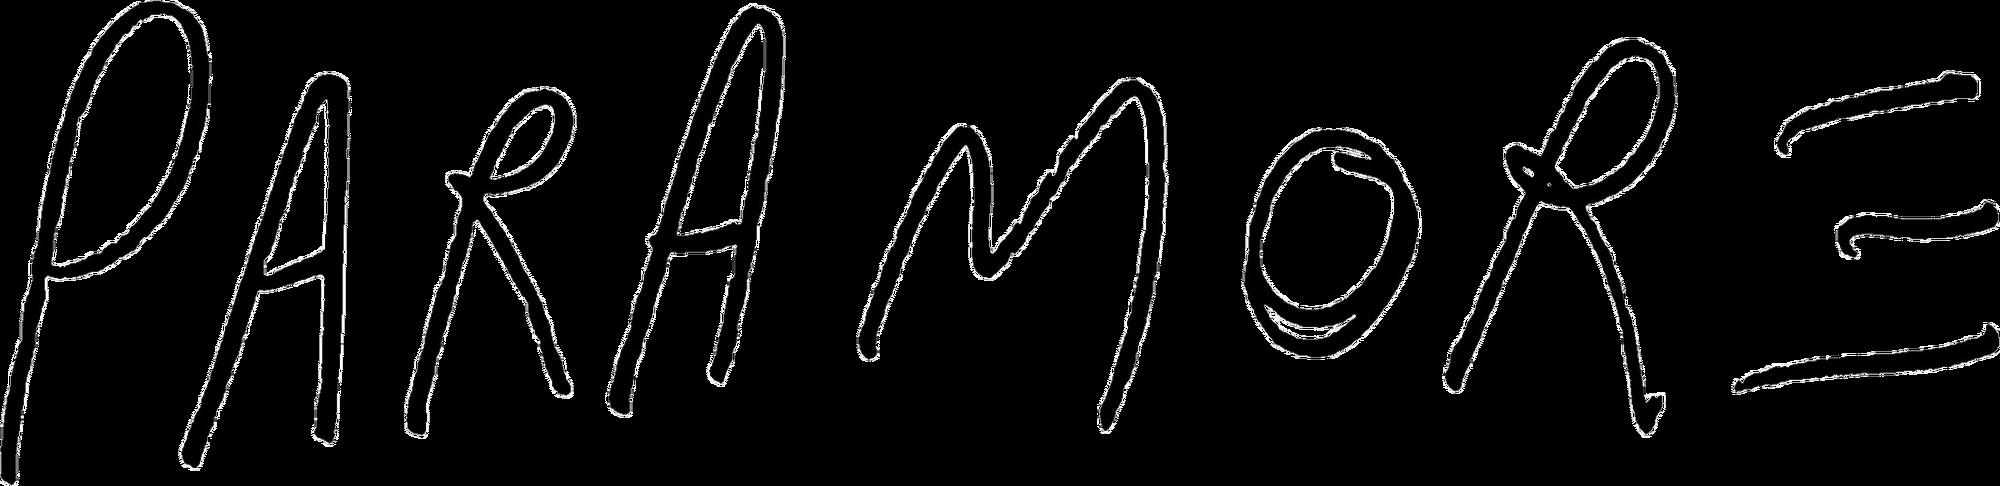 Category:Fueled by Ramen | Logopedia | Fandom powered by Wikia